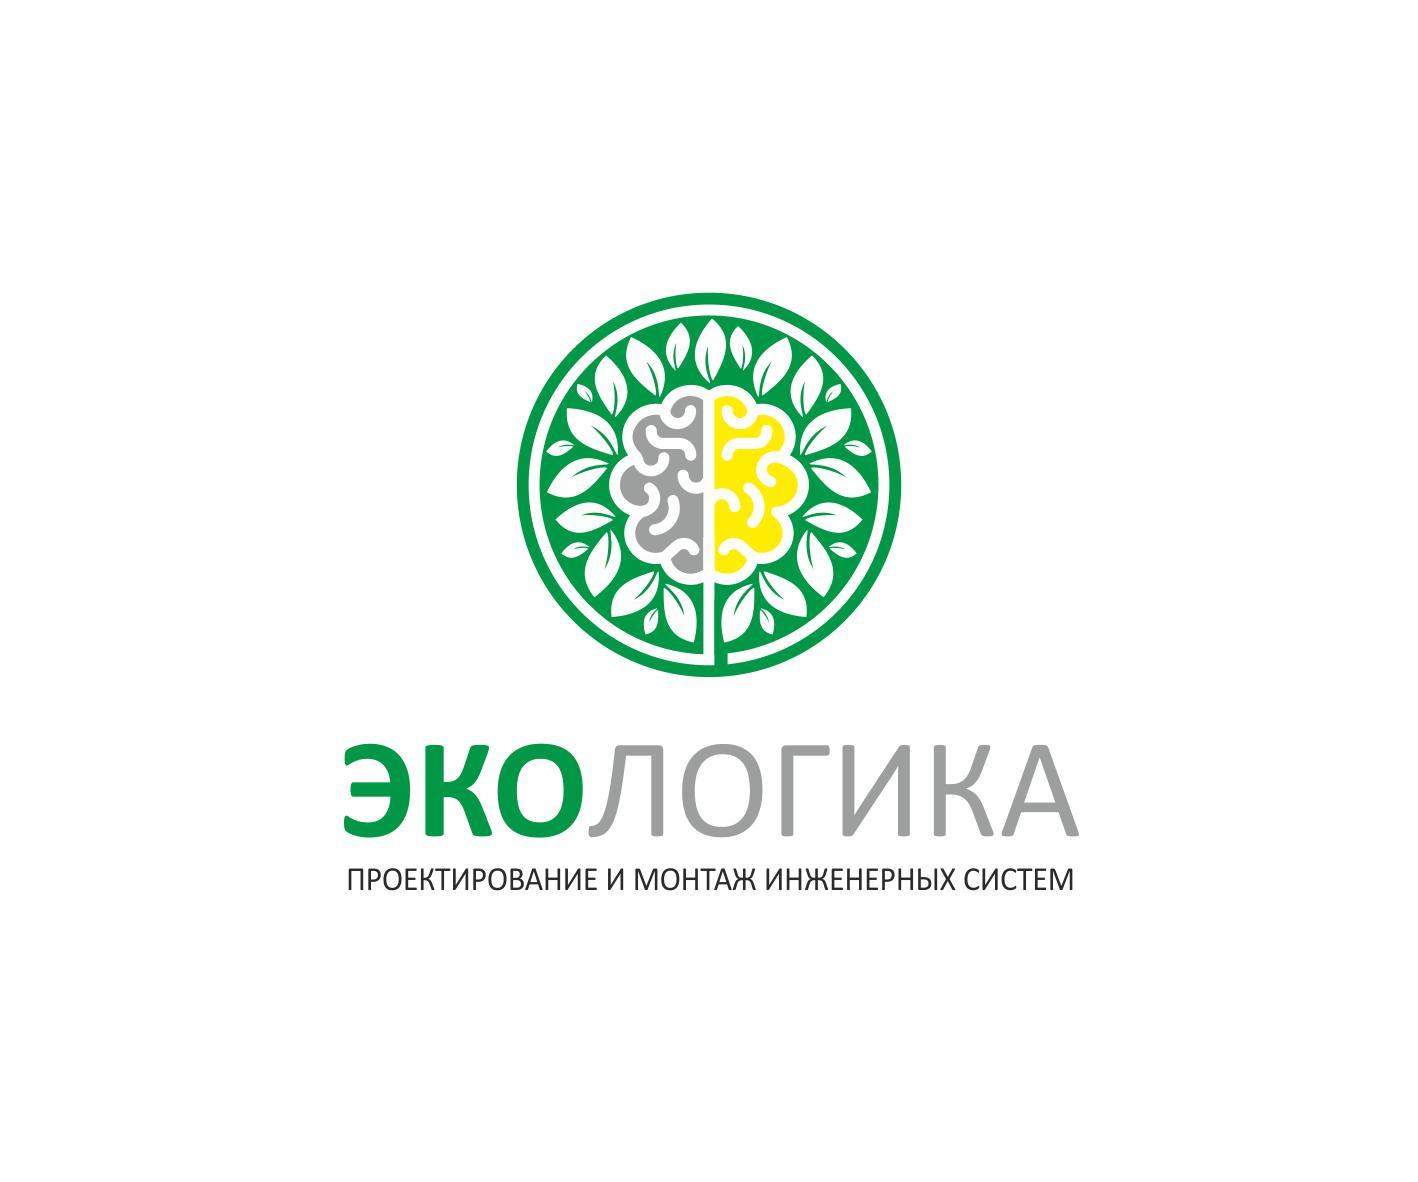 Логотип ЭКОЛОГИКА фото f_38059370aff8ffa2.jpg